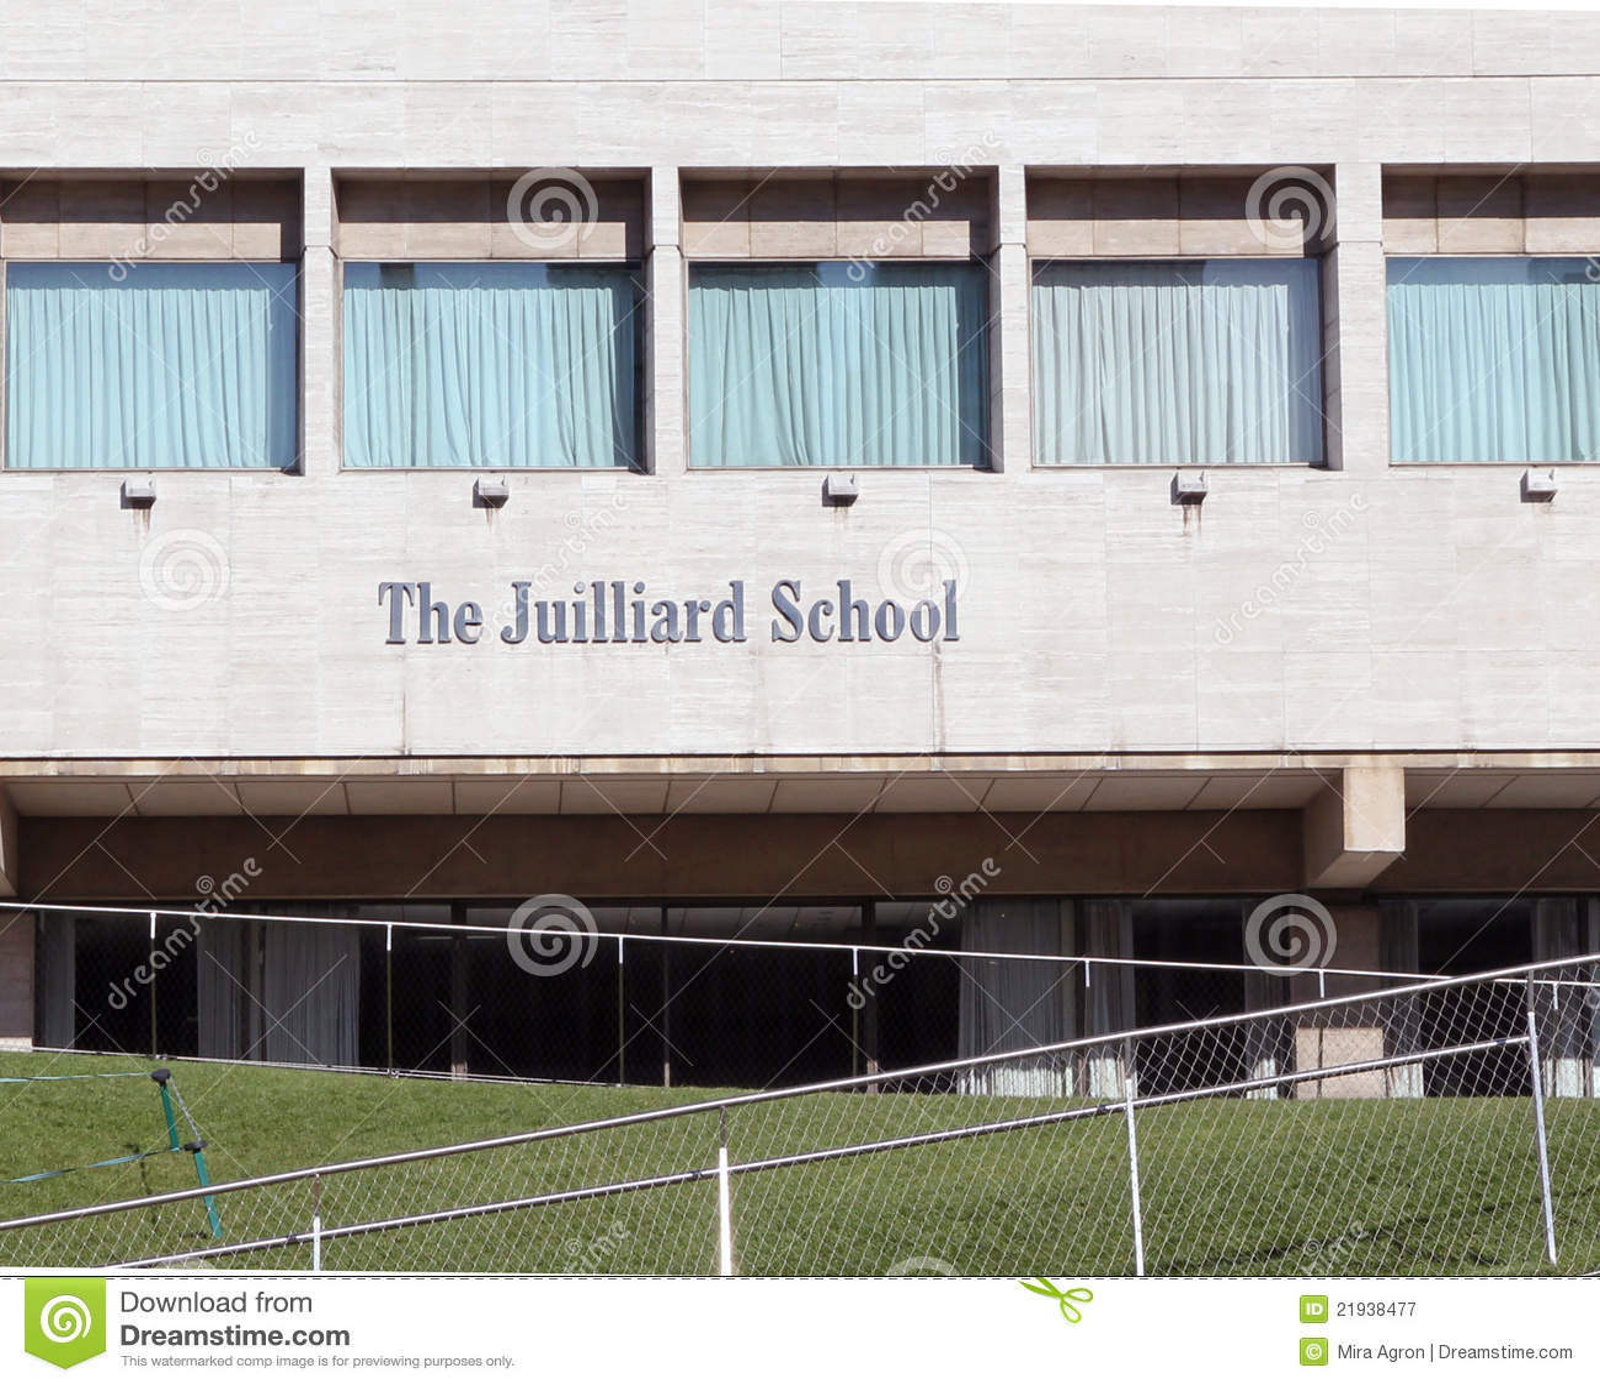 The Juilliard School editorial photography  Image of